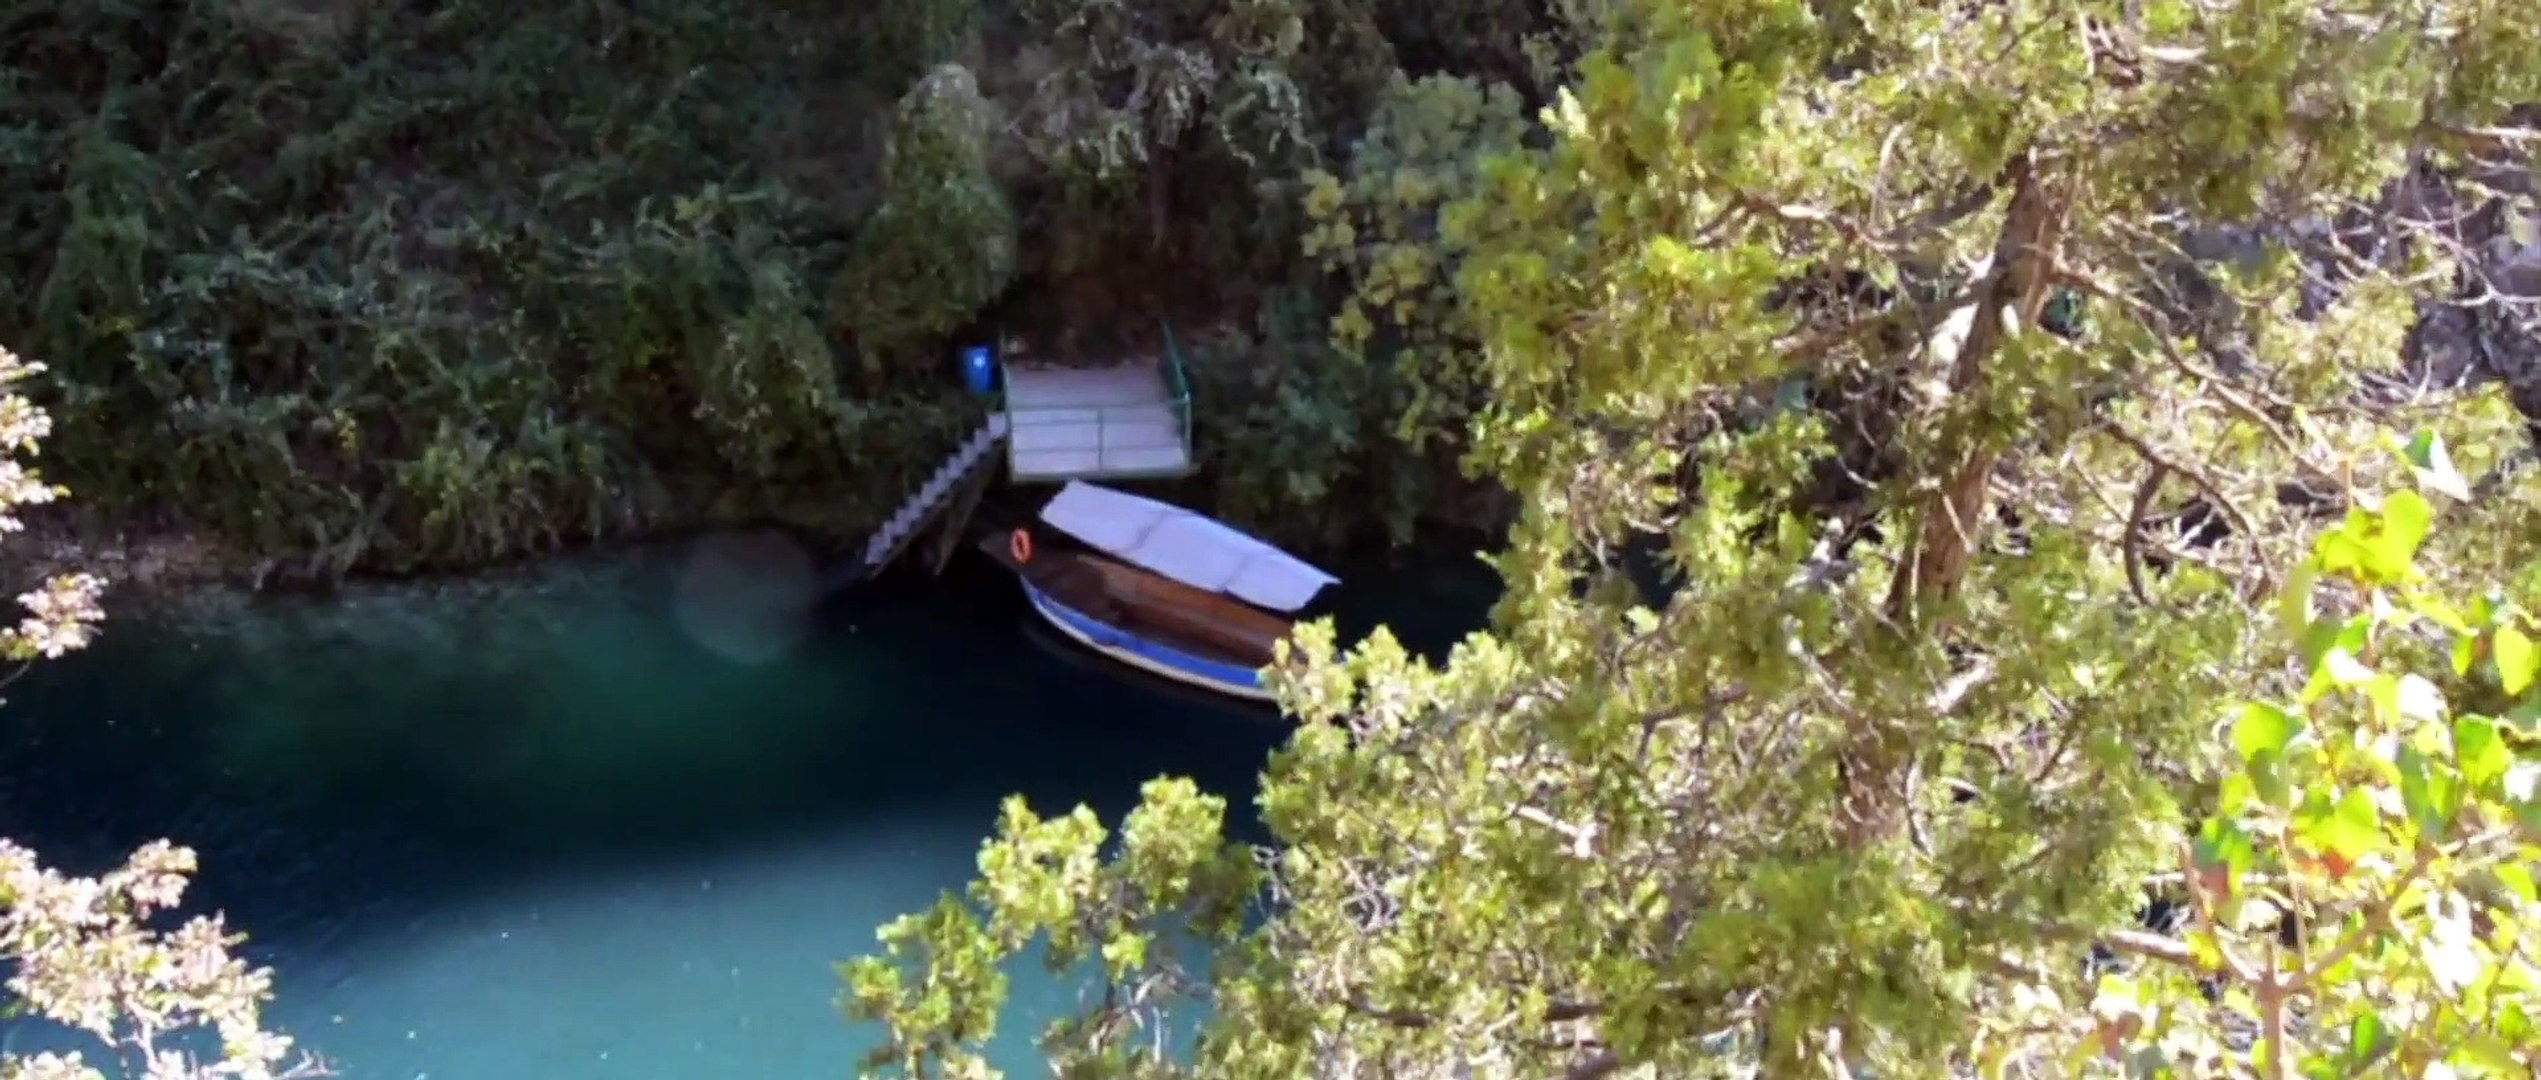 VAN LIFE Documentary - Our family's journey around Europe